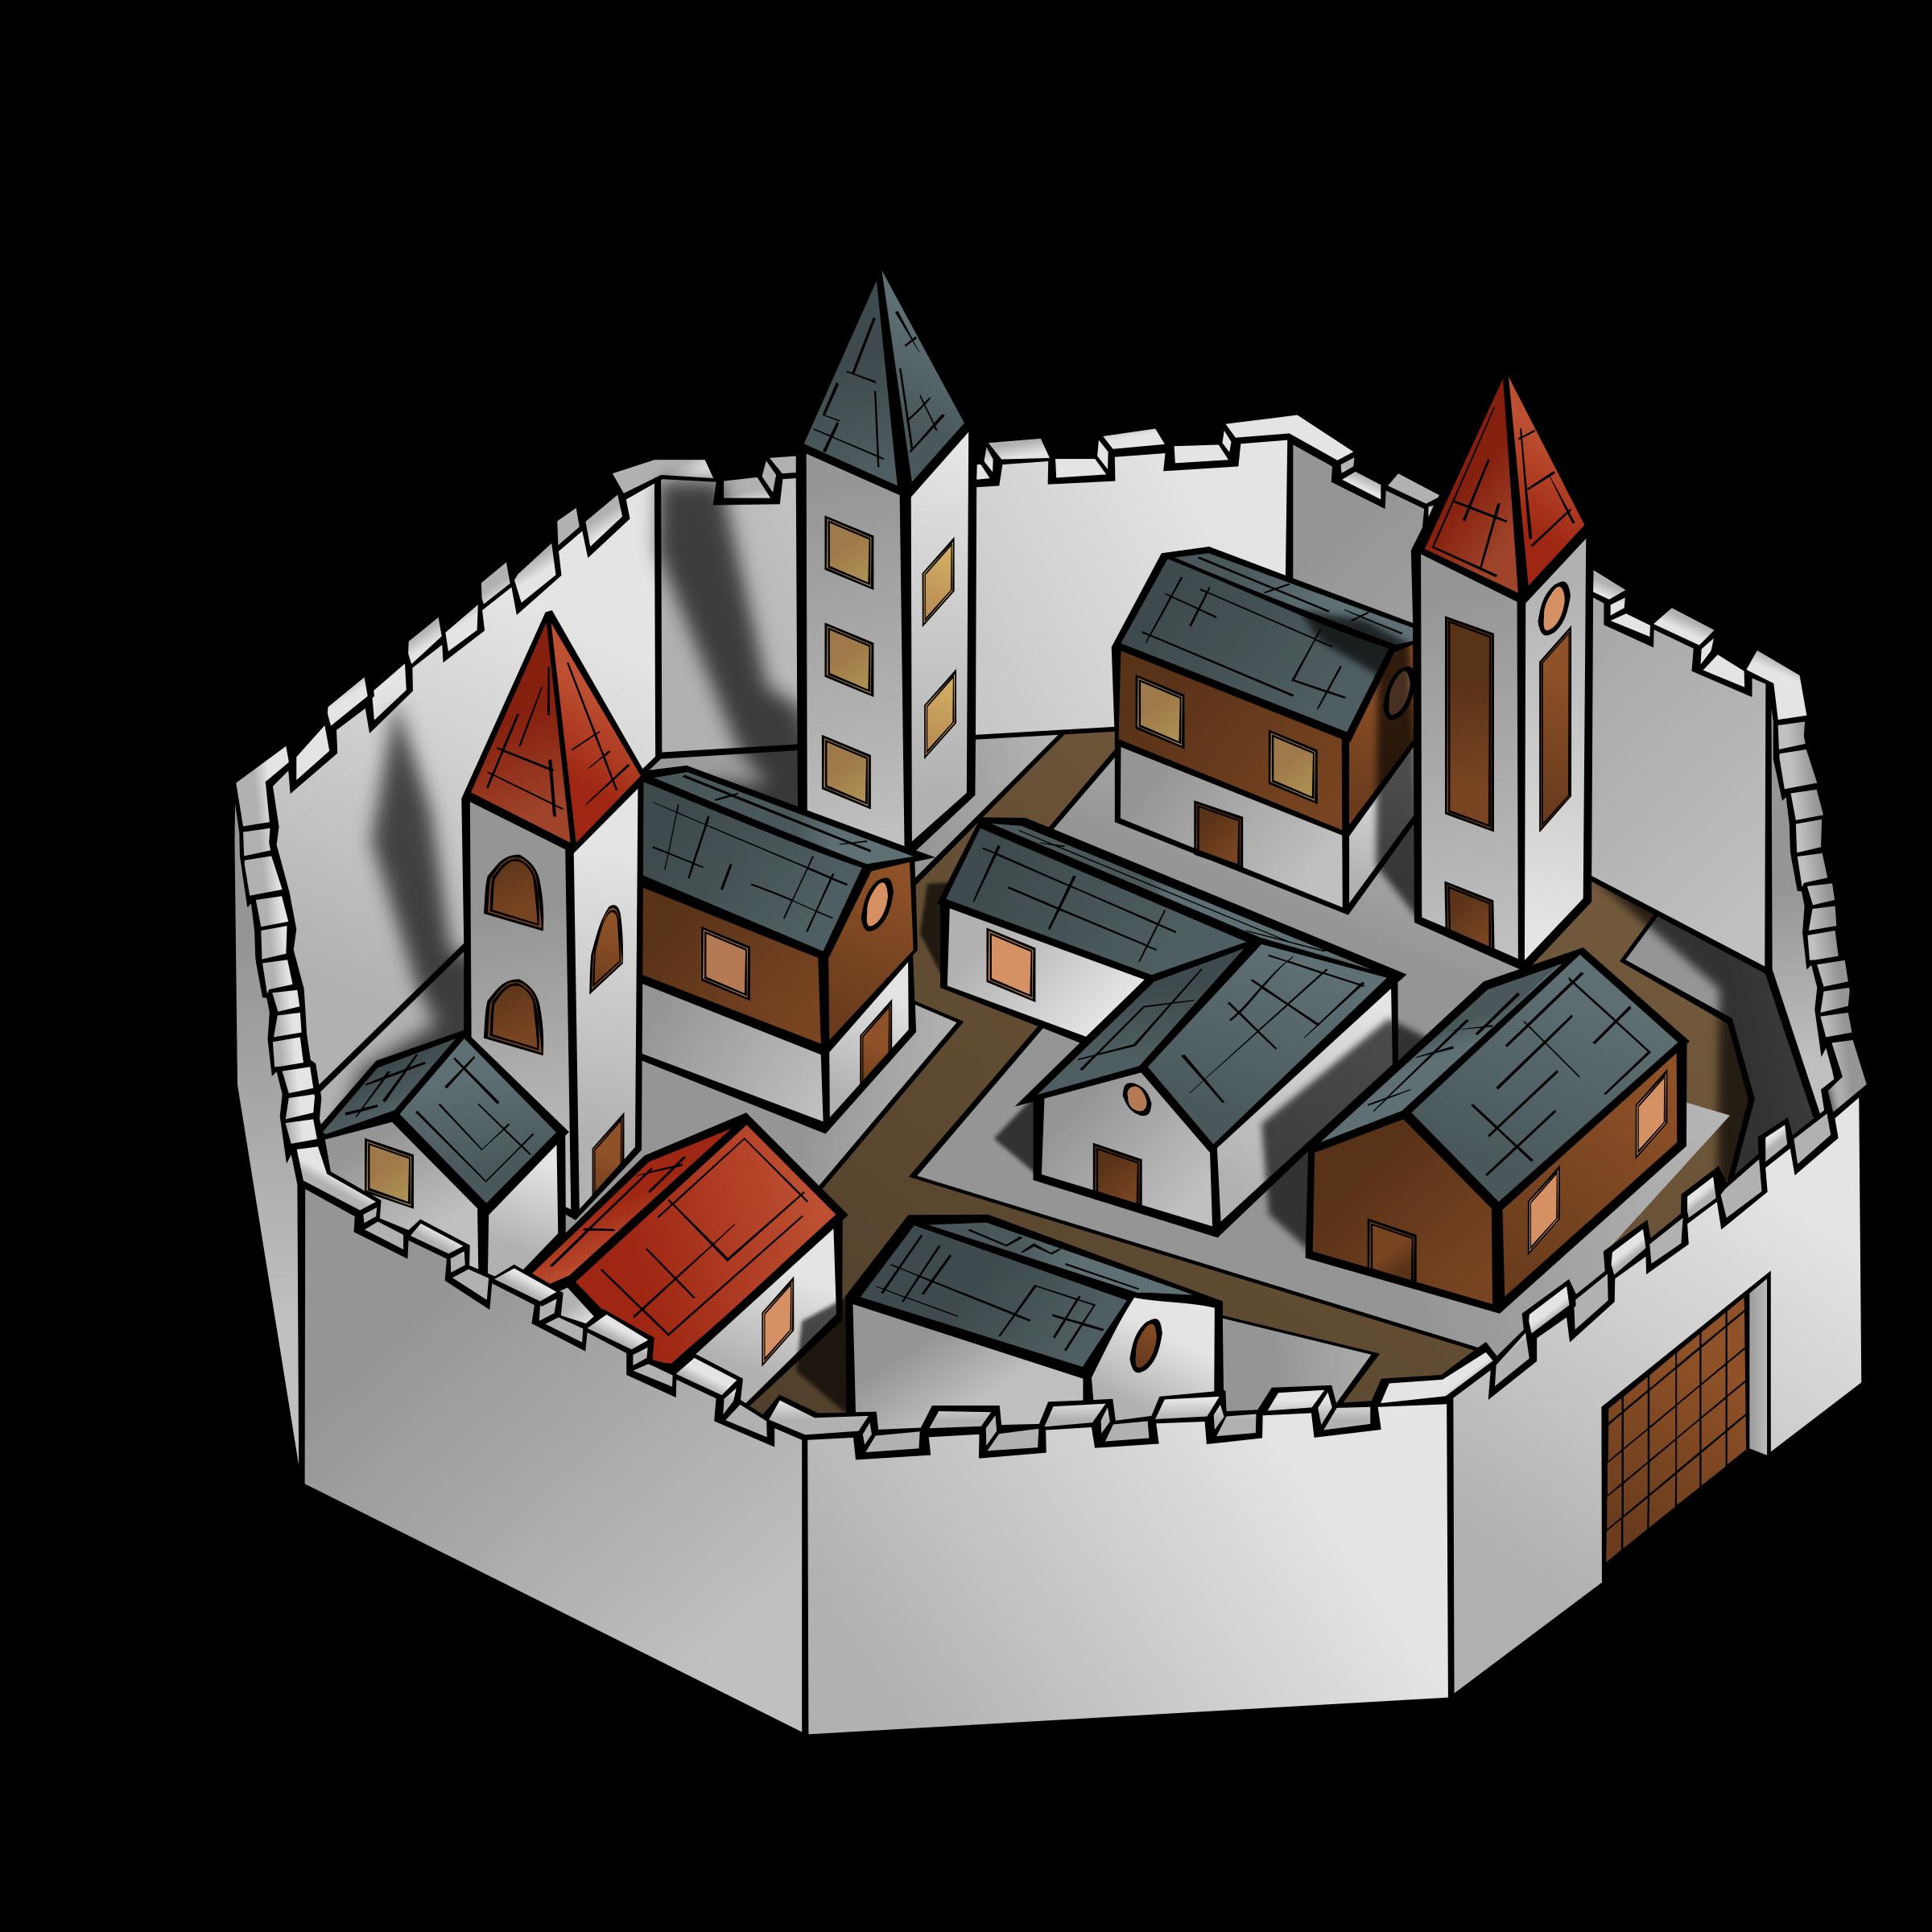 City clipart architecture. Rpg map symbols big